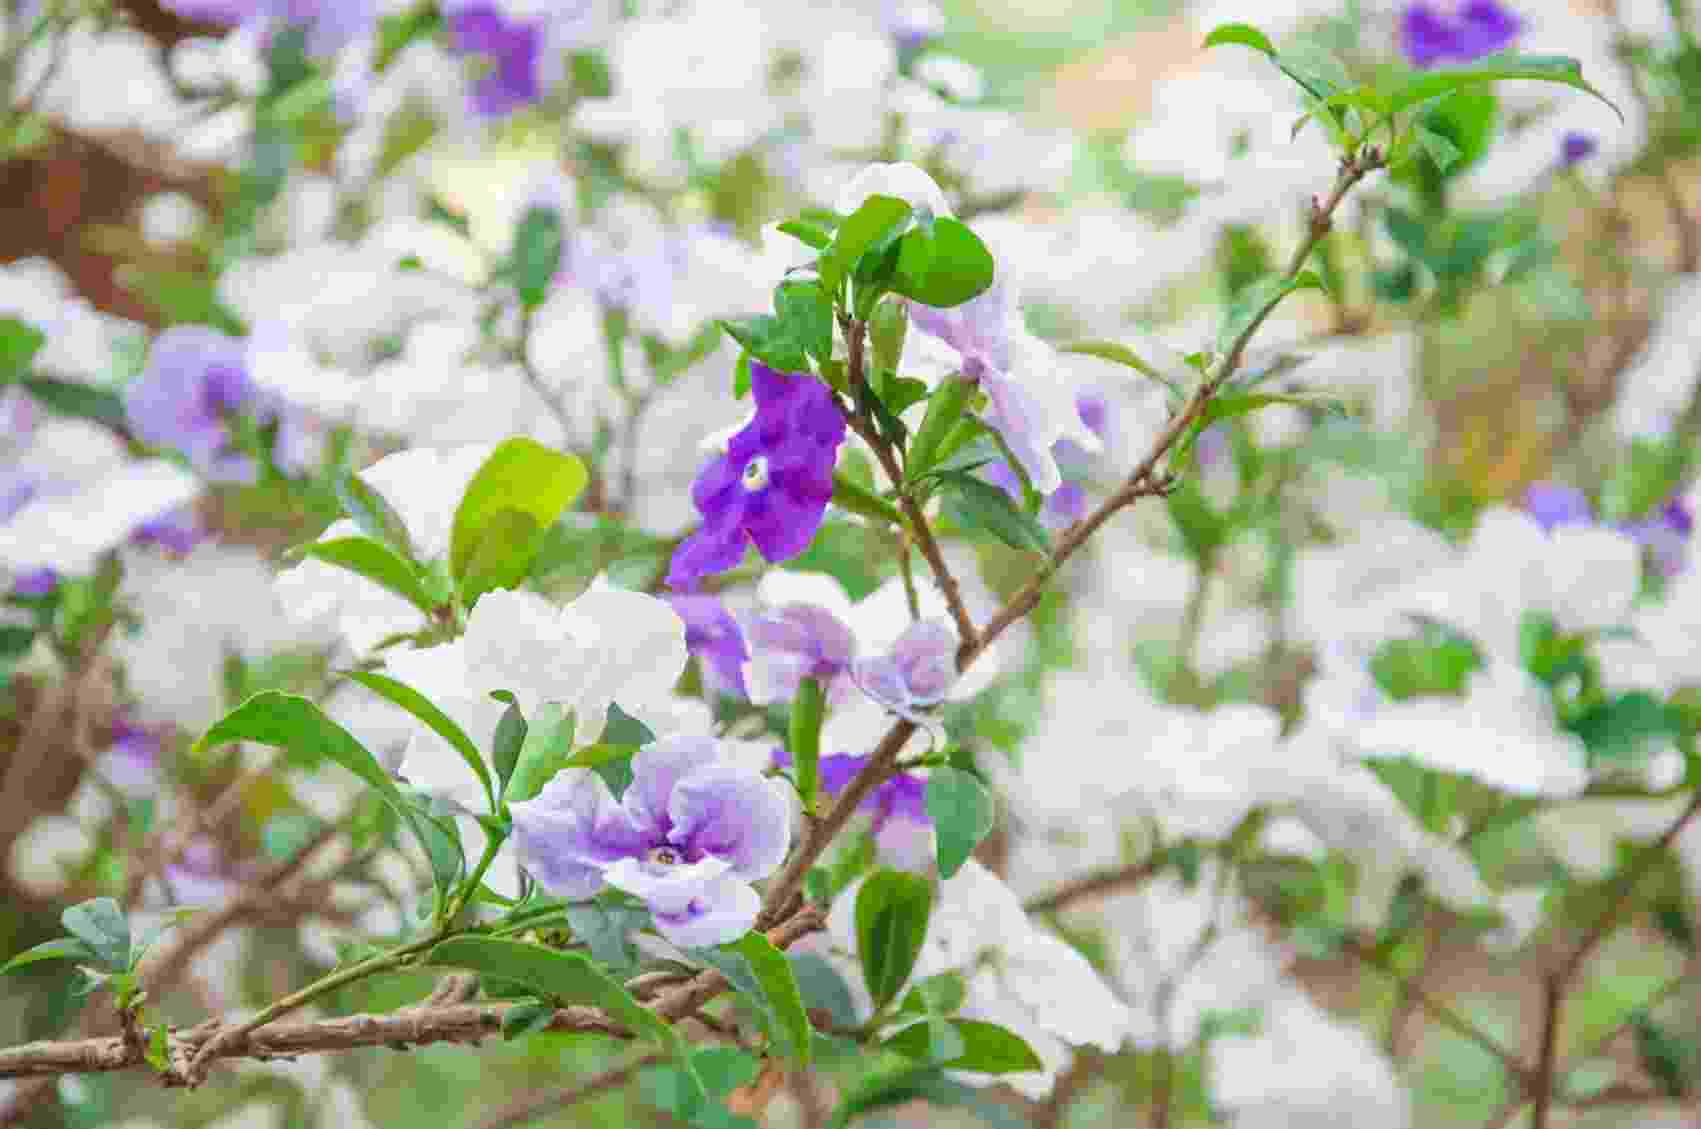 Brunfelsia uniflora - manacá-de-cheiro - Getty Images